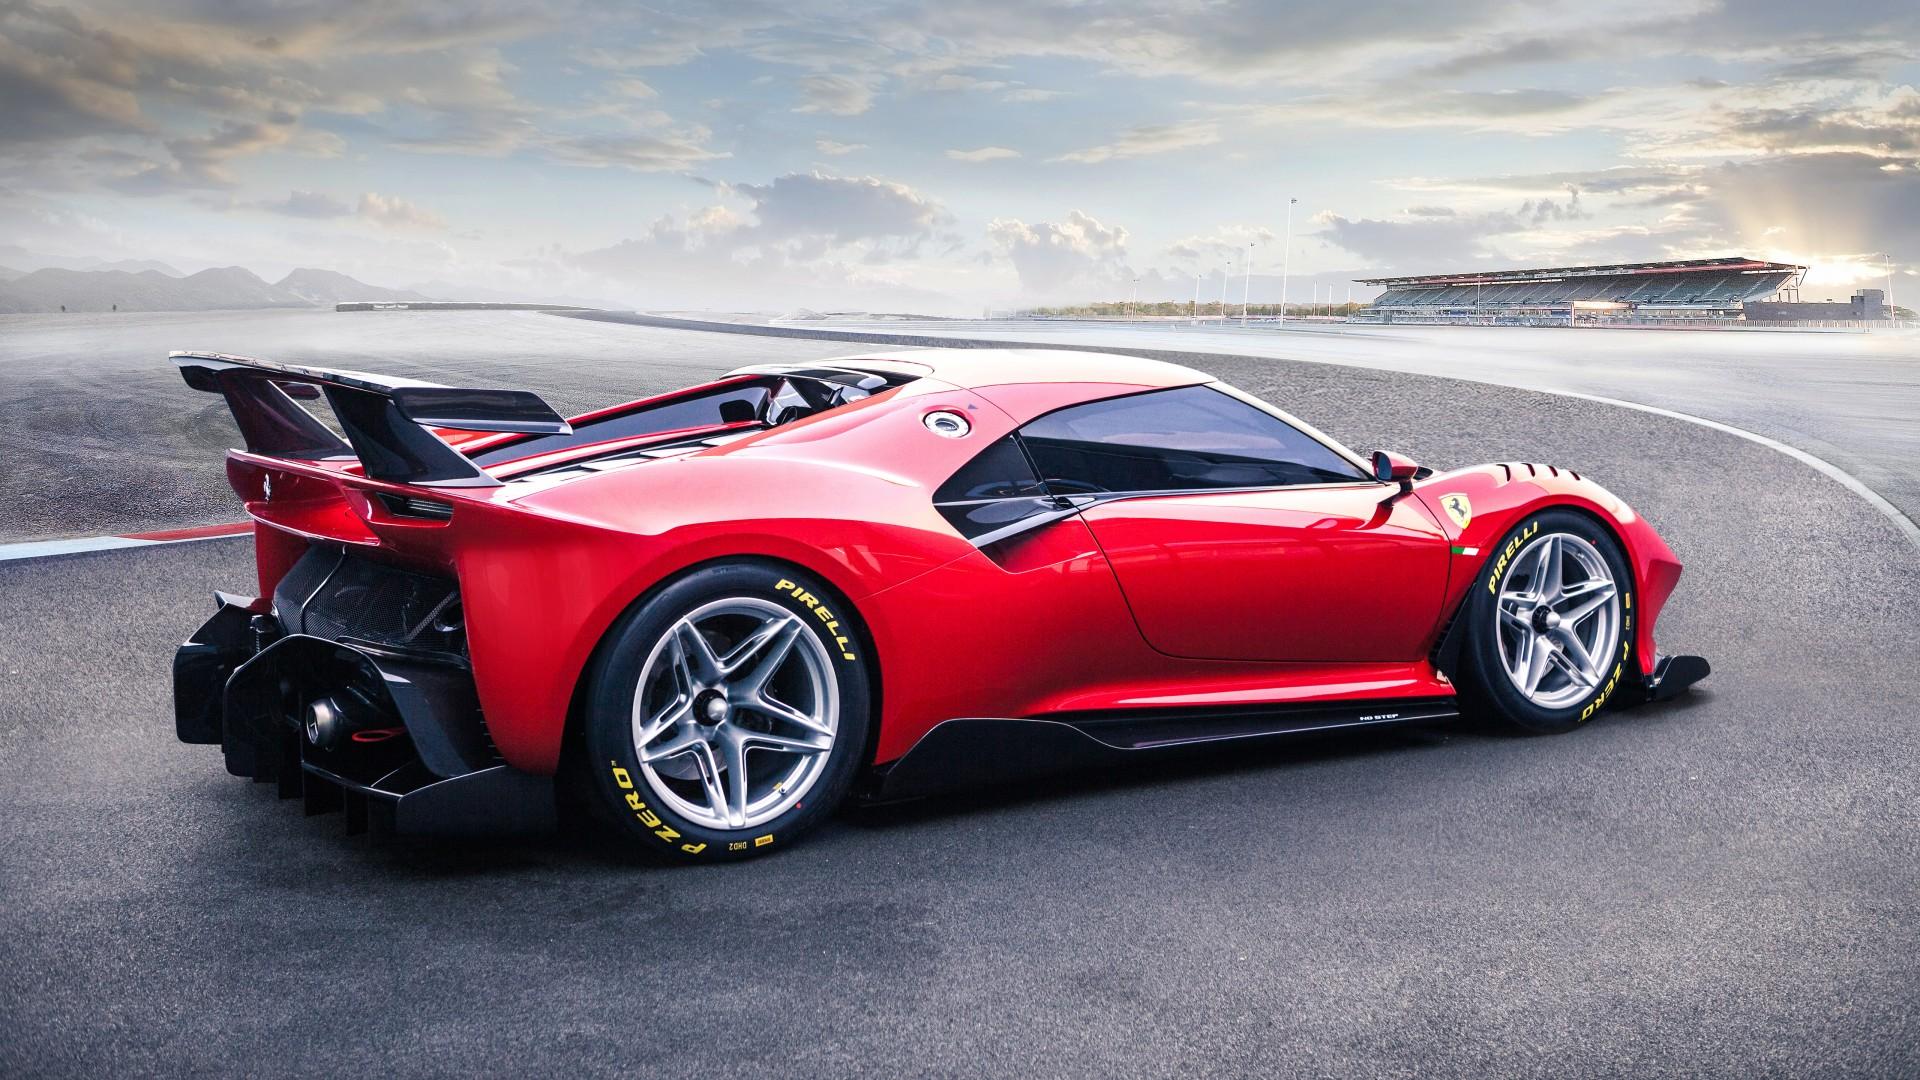 Hd Car Wallpapers 1600x1200 Ferrari P80c 2019 5k Wallpapers Hd Wallpapers Id 28006